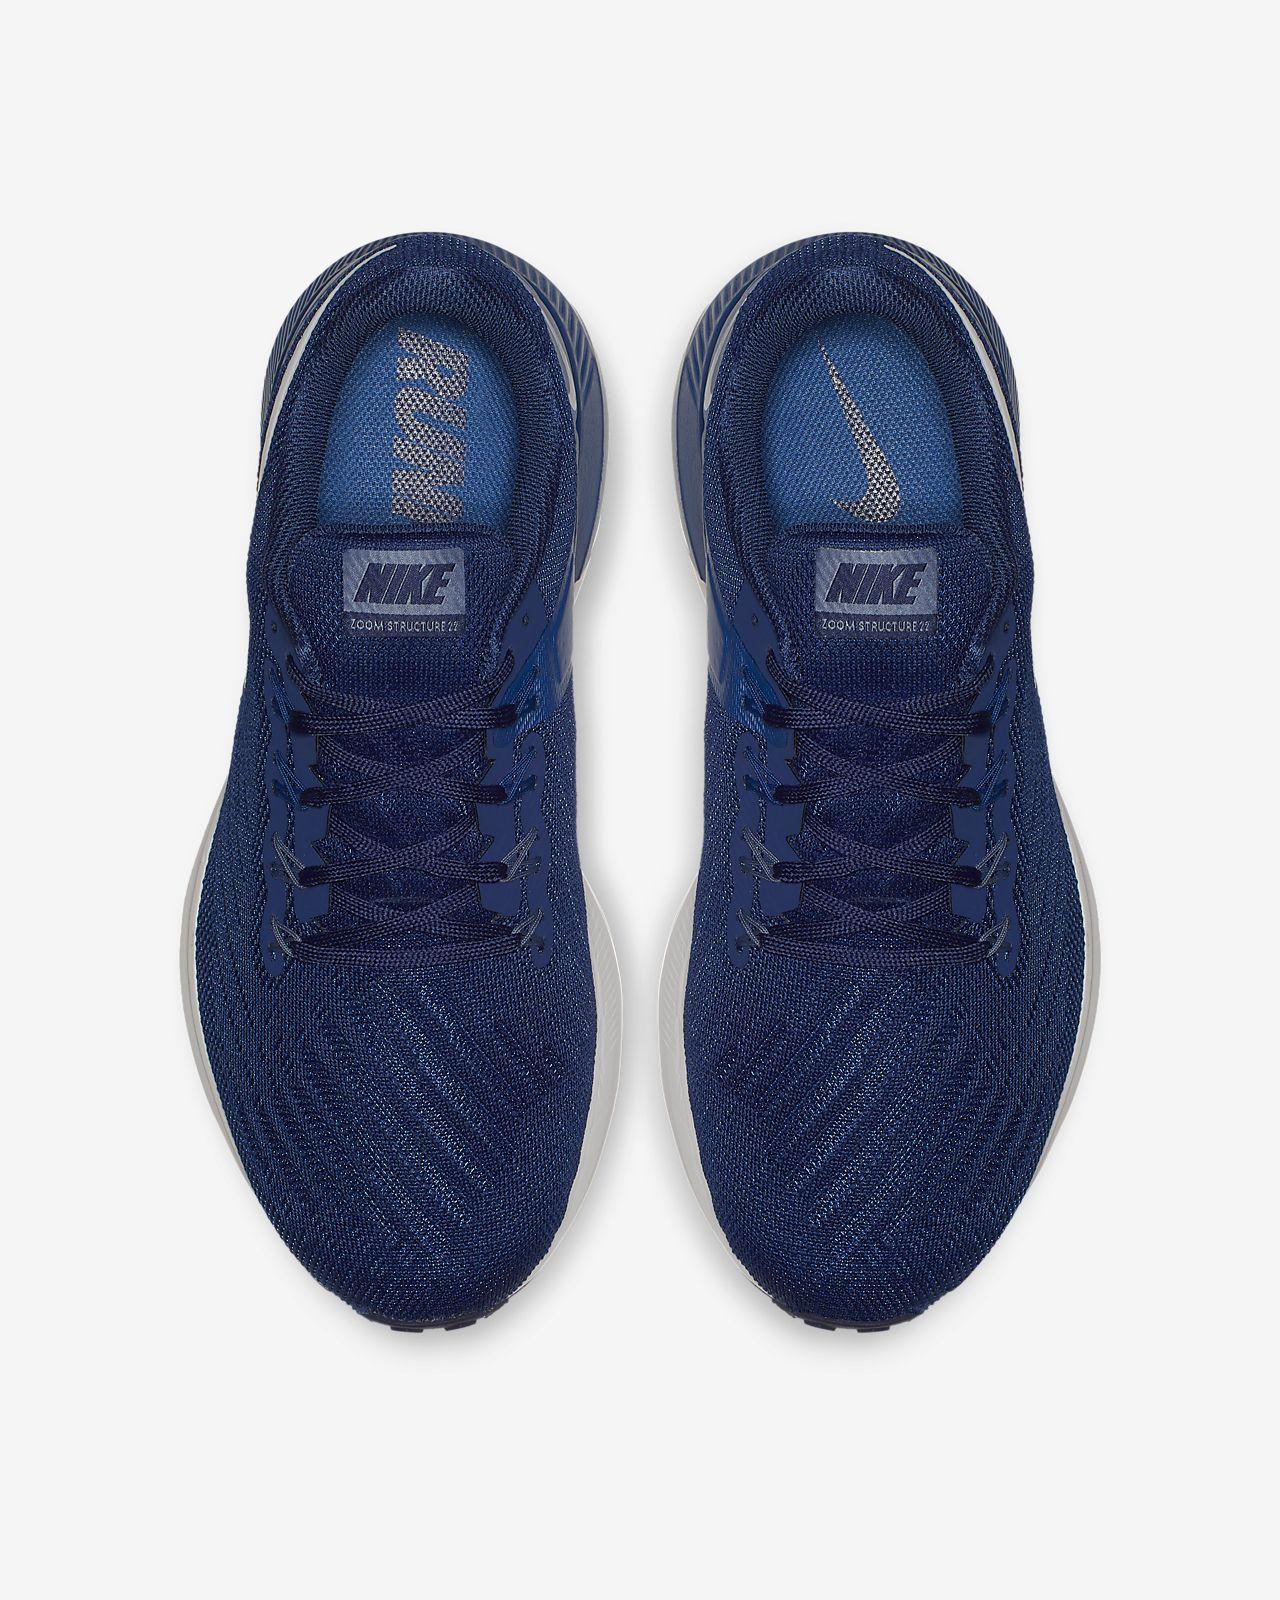 Zoom Structure Herren LaufschuhExtraweit Air Nike 22 76gIYvbyf